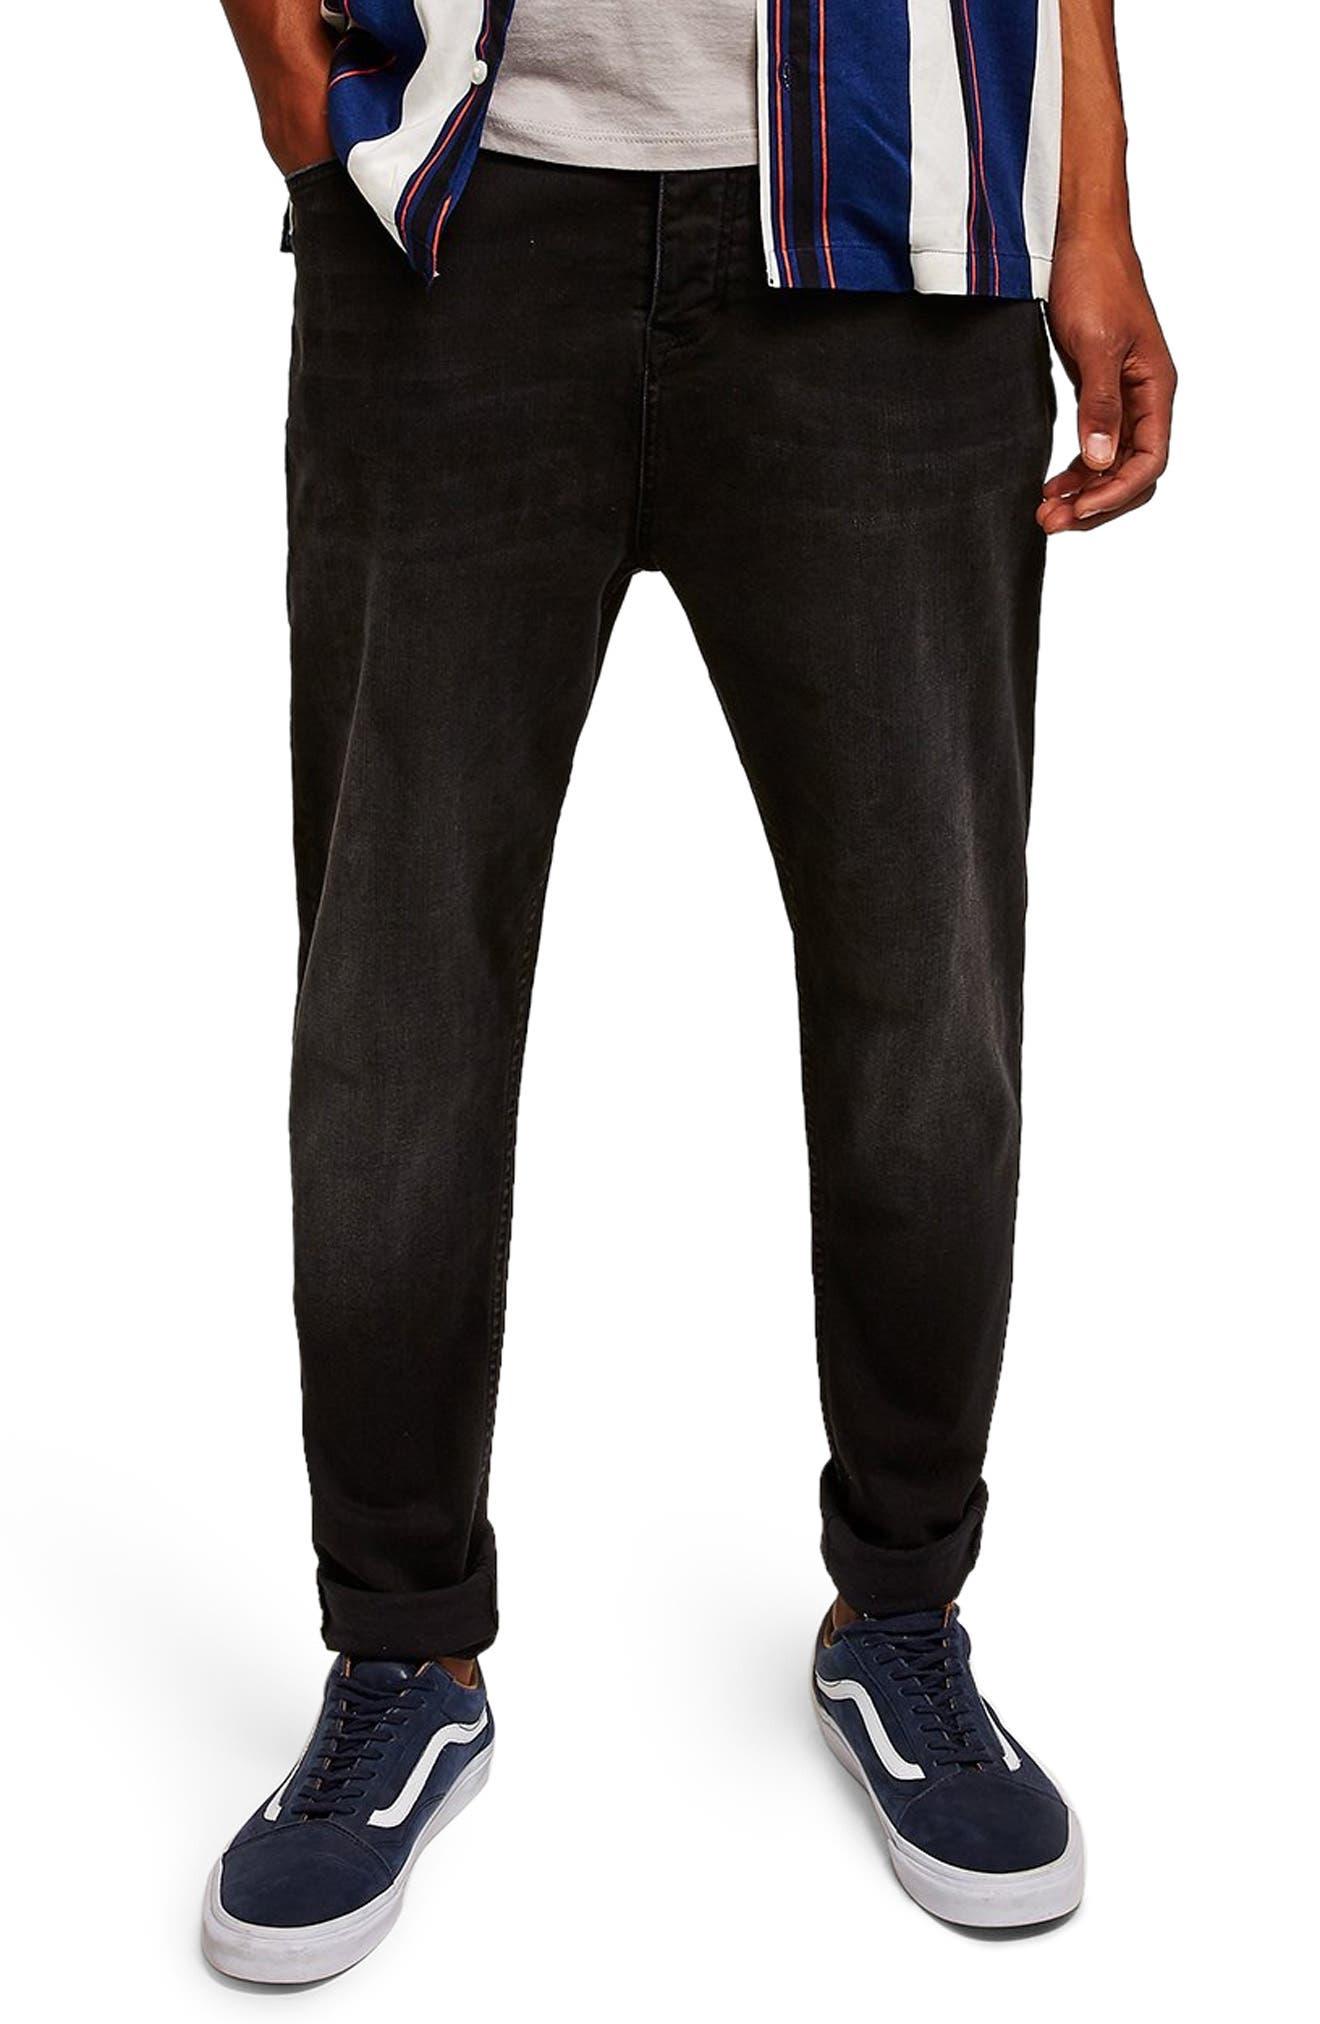 Topshop Jogger Skinny Jeans,                             Main thumbnail 1, color,                             BLACK